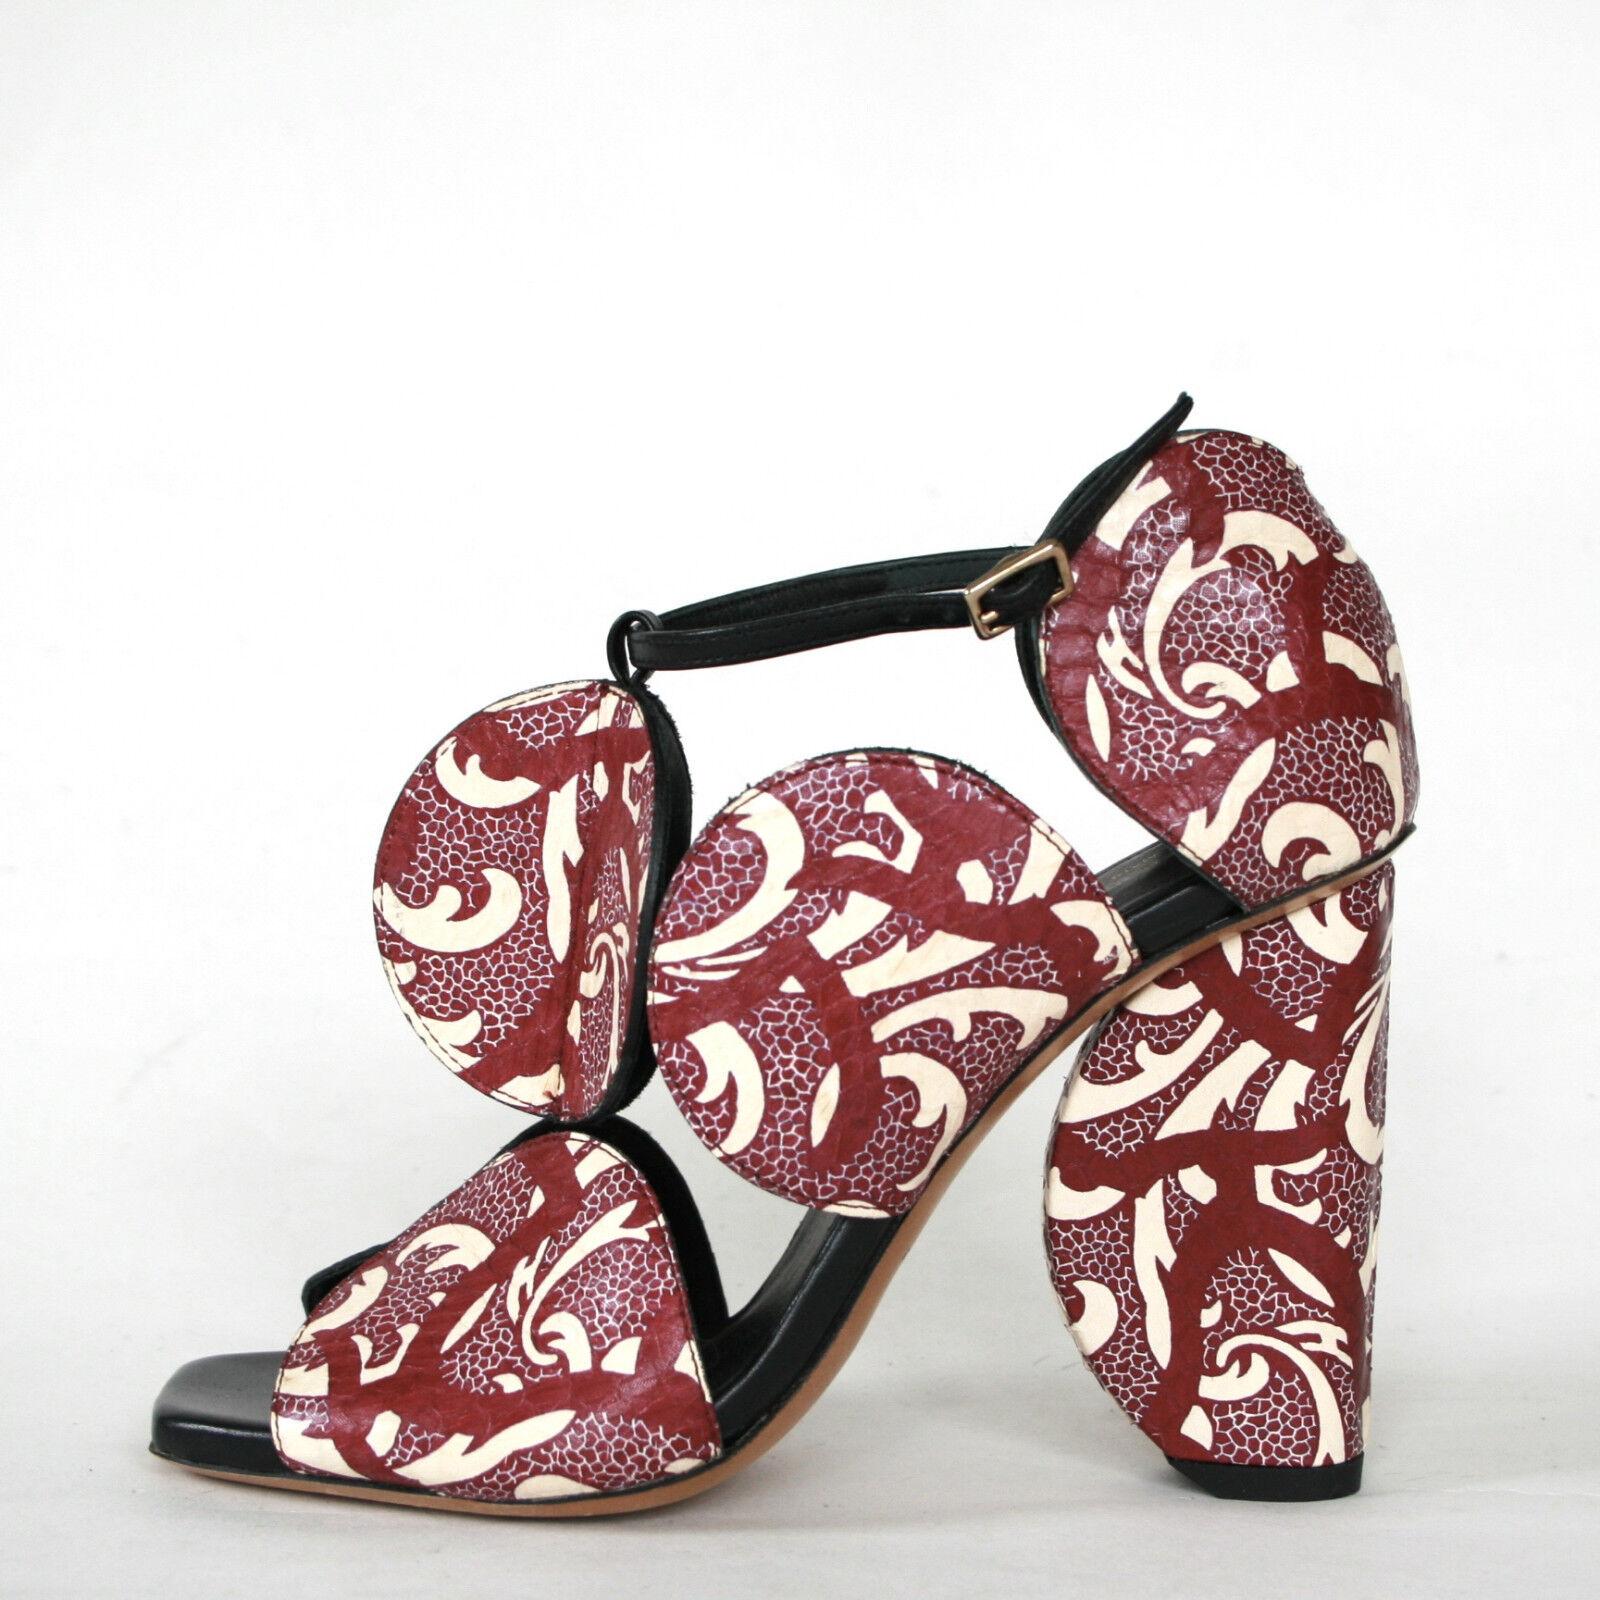 vendita scontata DRIES VAN NOTEN circle circle circle cut high heel rosso pattern sandal square toed scarpe 35 NEW  nuovi prodotti novità